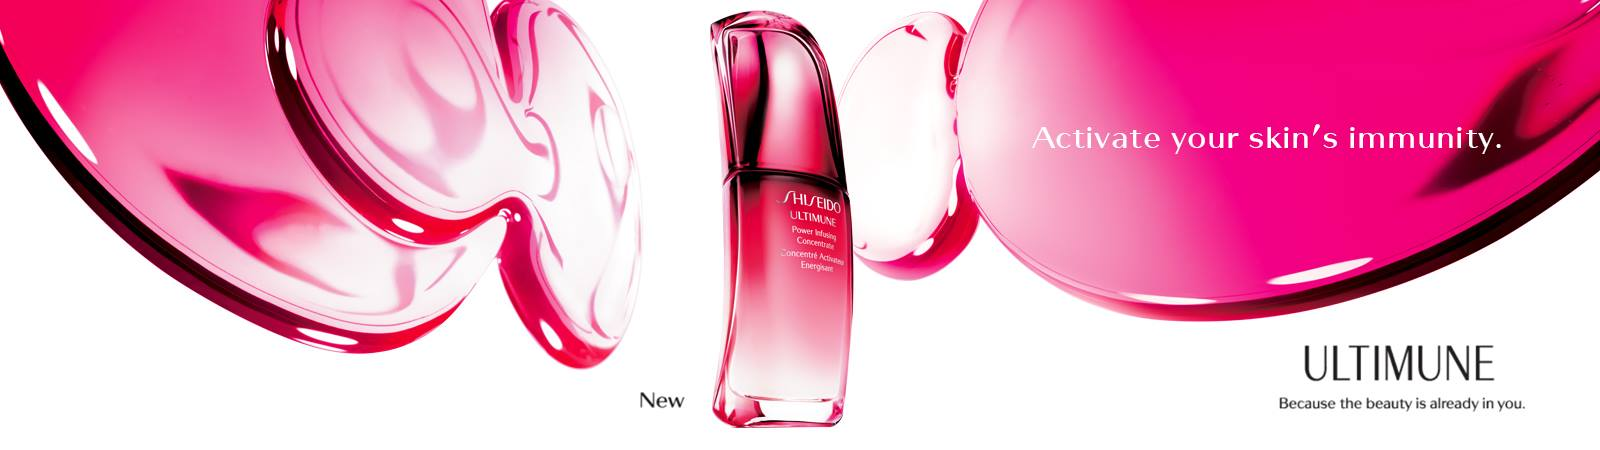 Schoonheidssalon Shiseido